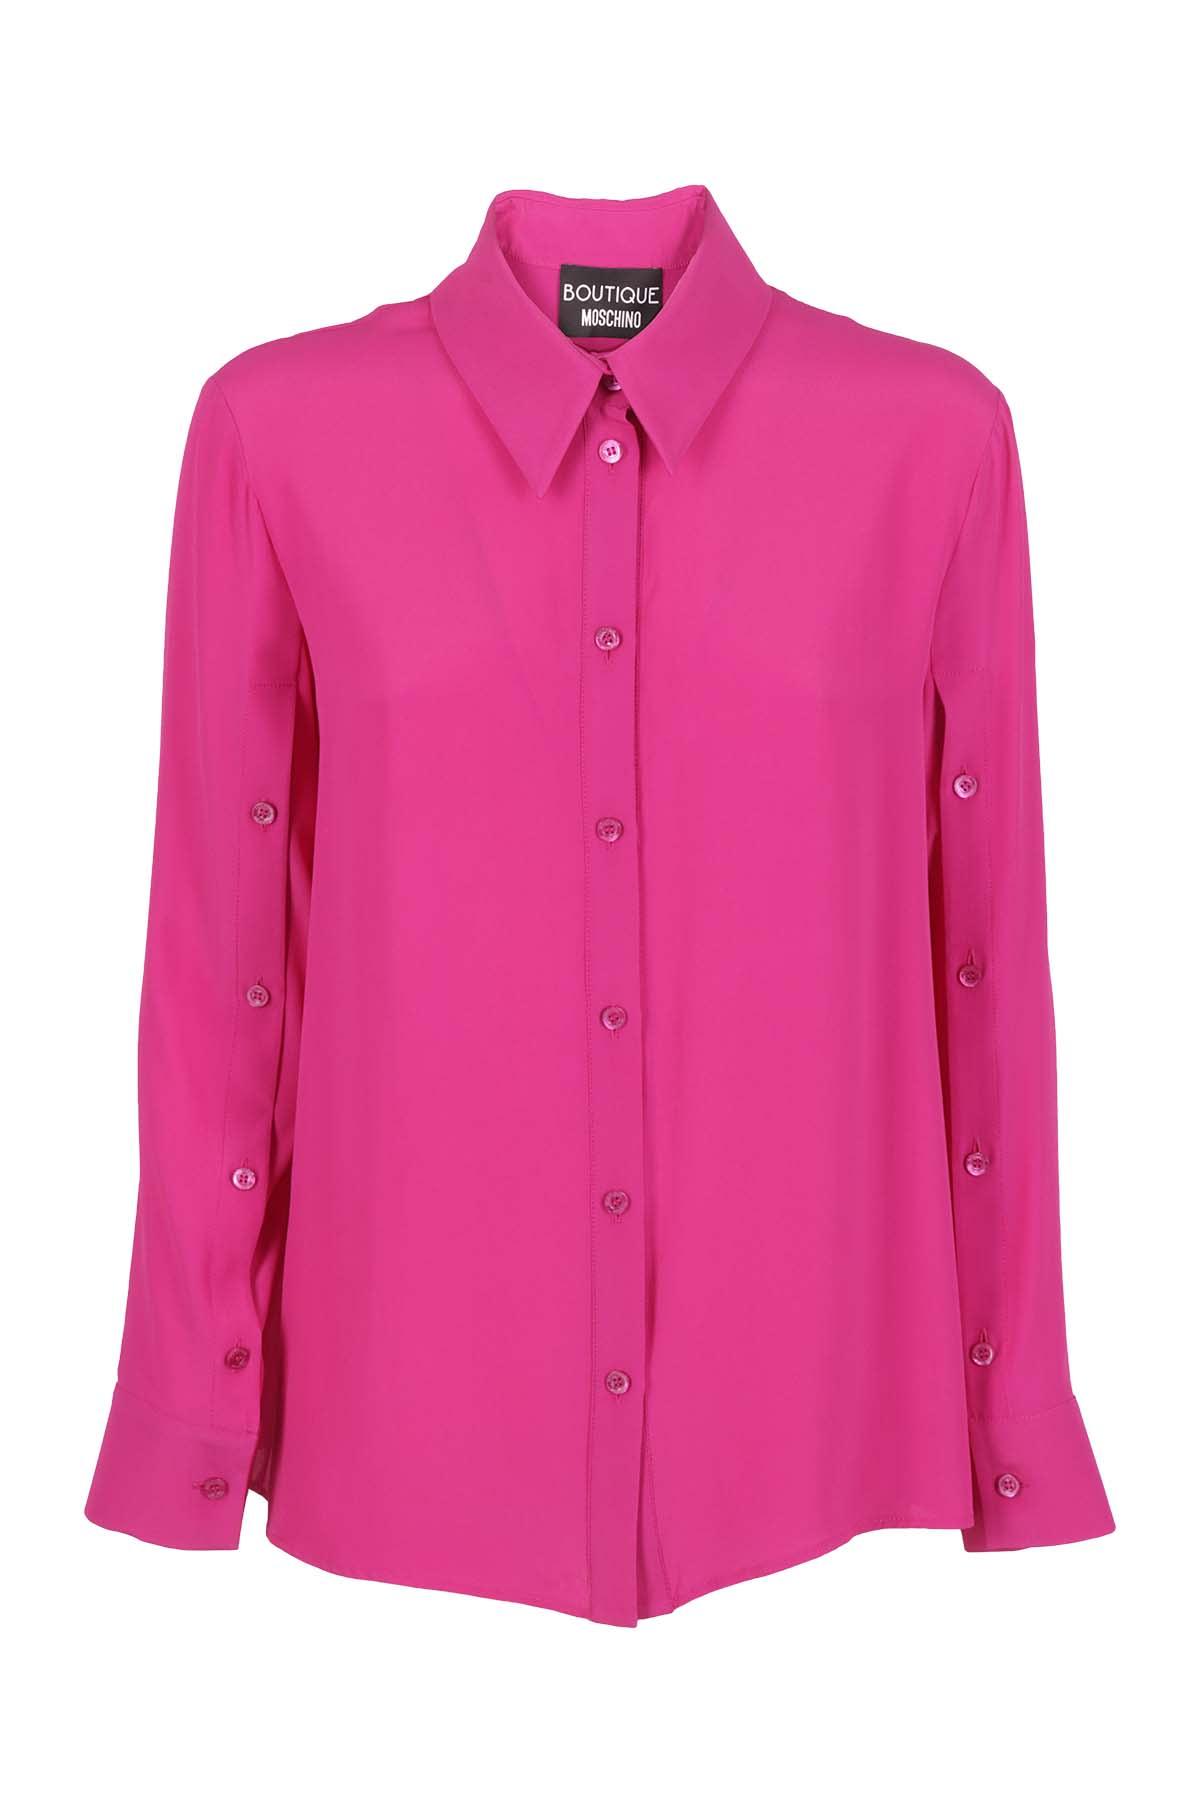 Boutique Moschino Shirt